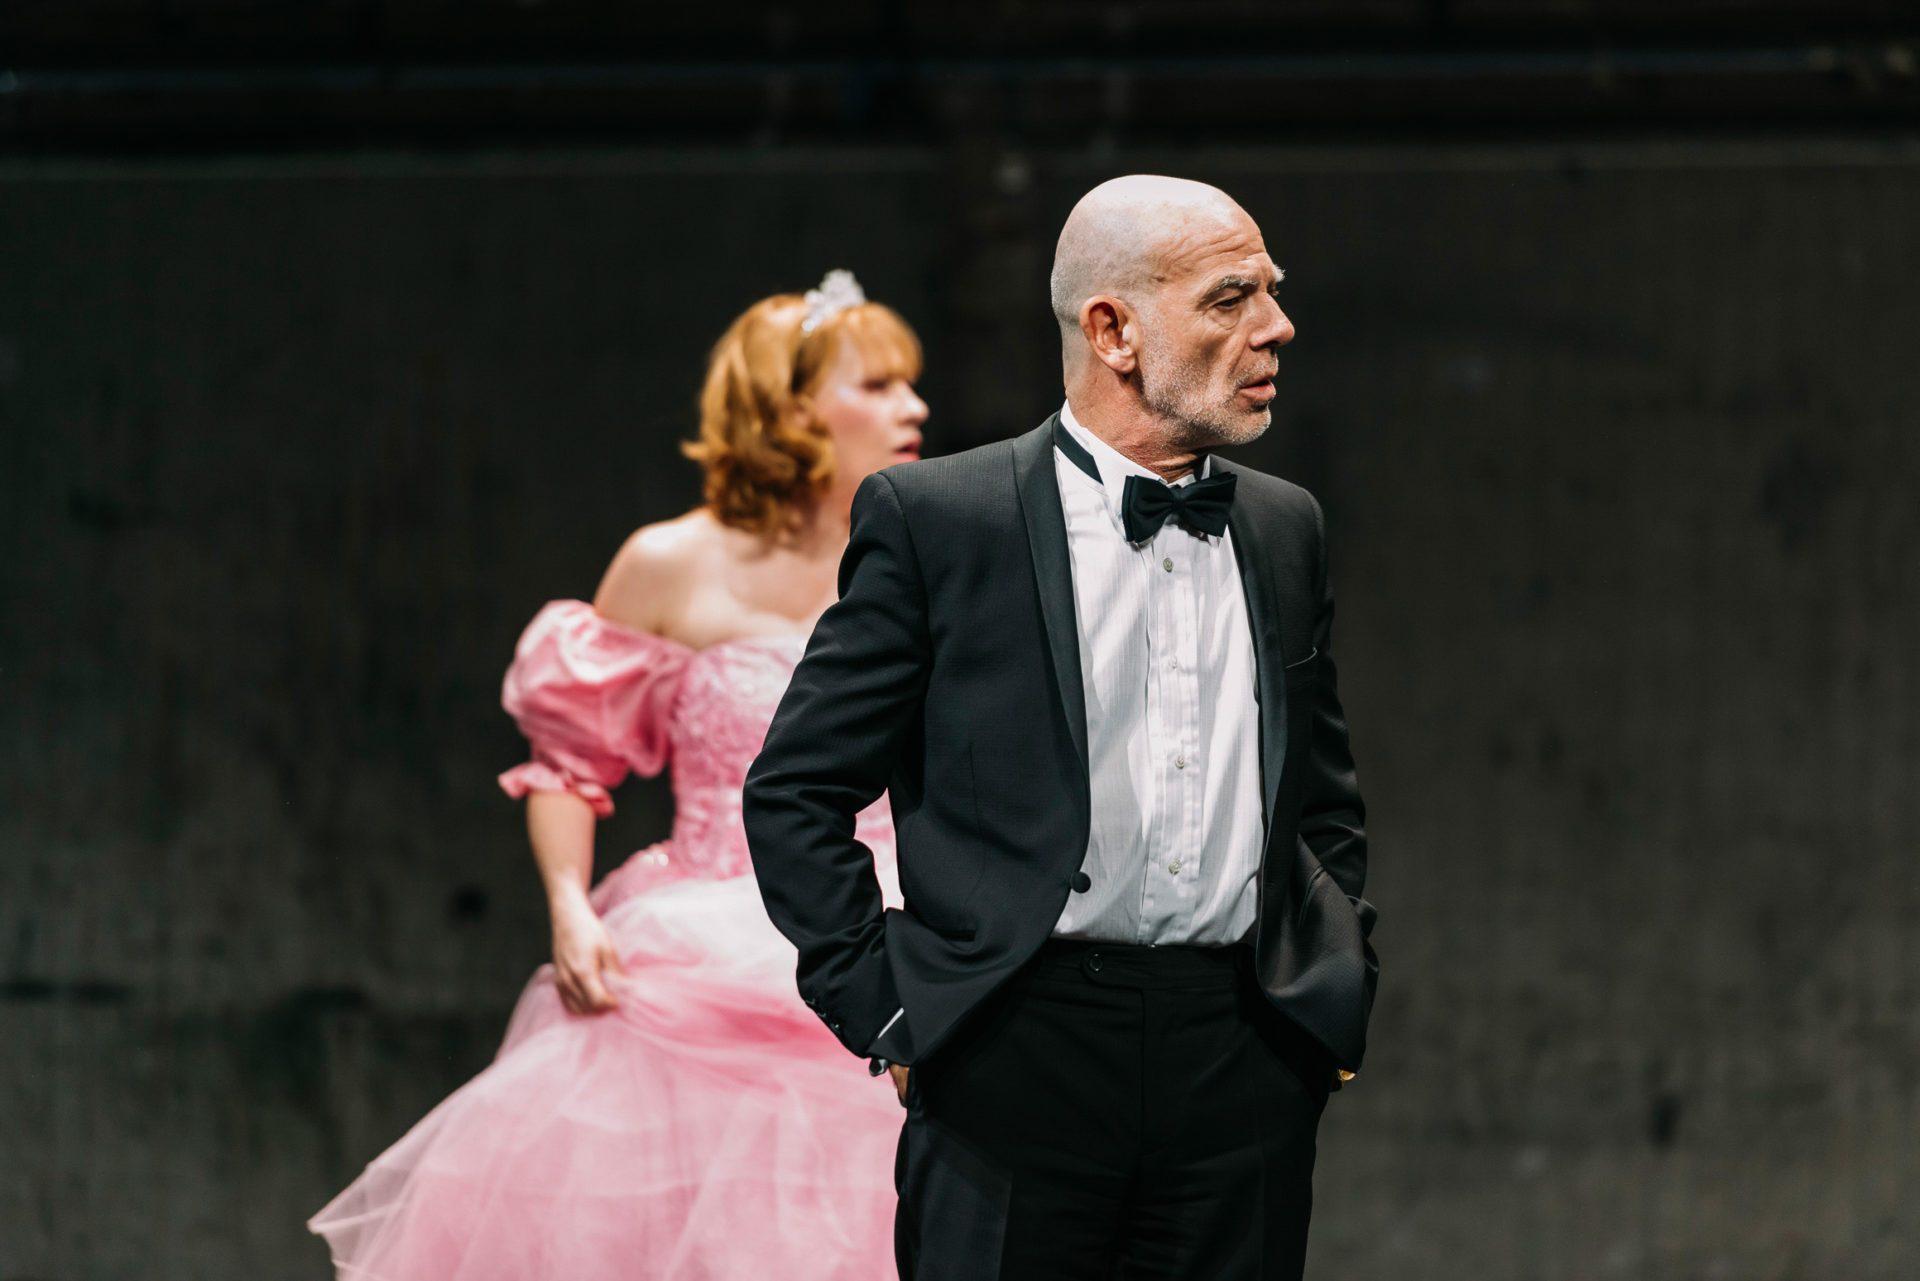 Akademietheater Wien